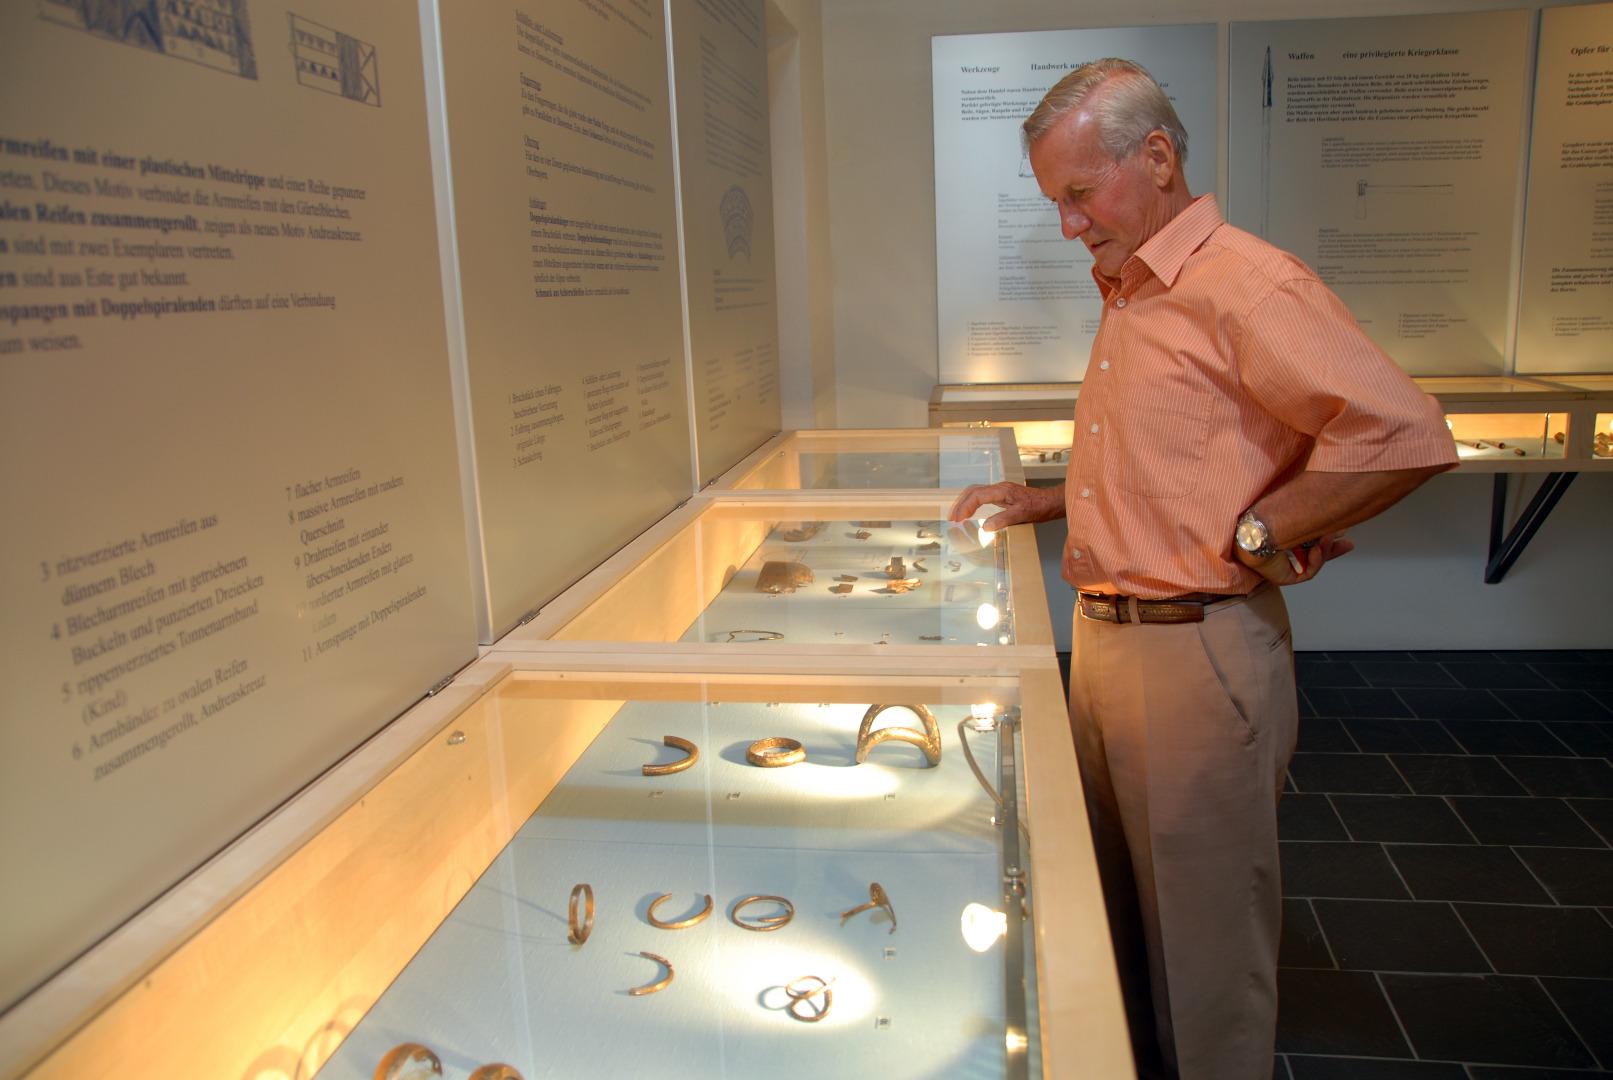 Archaeological Museum Fließ